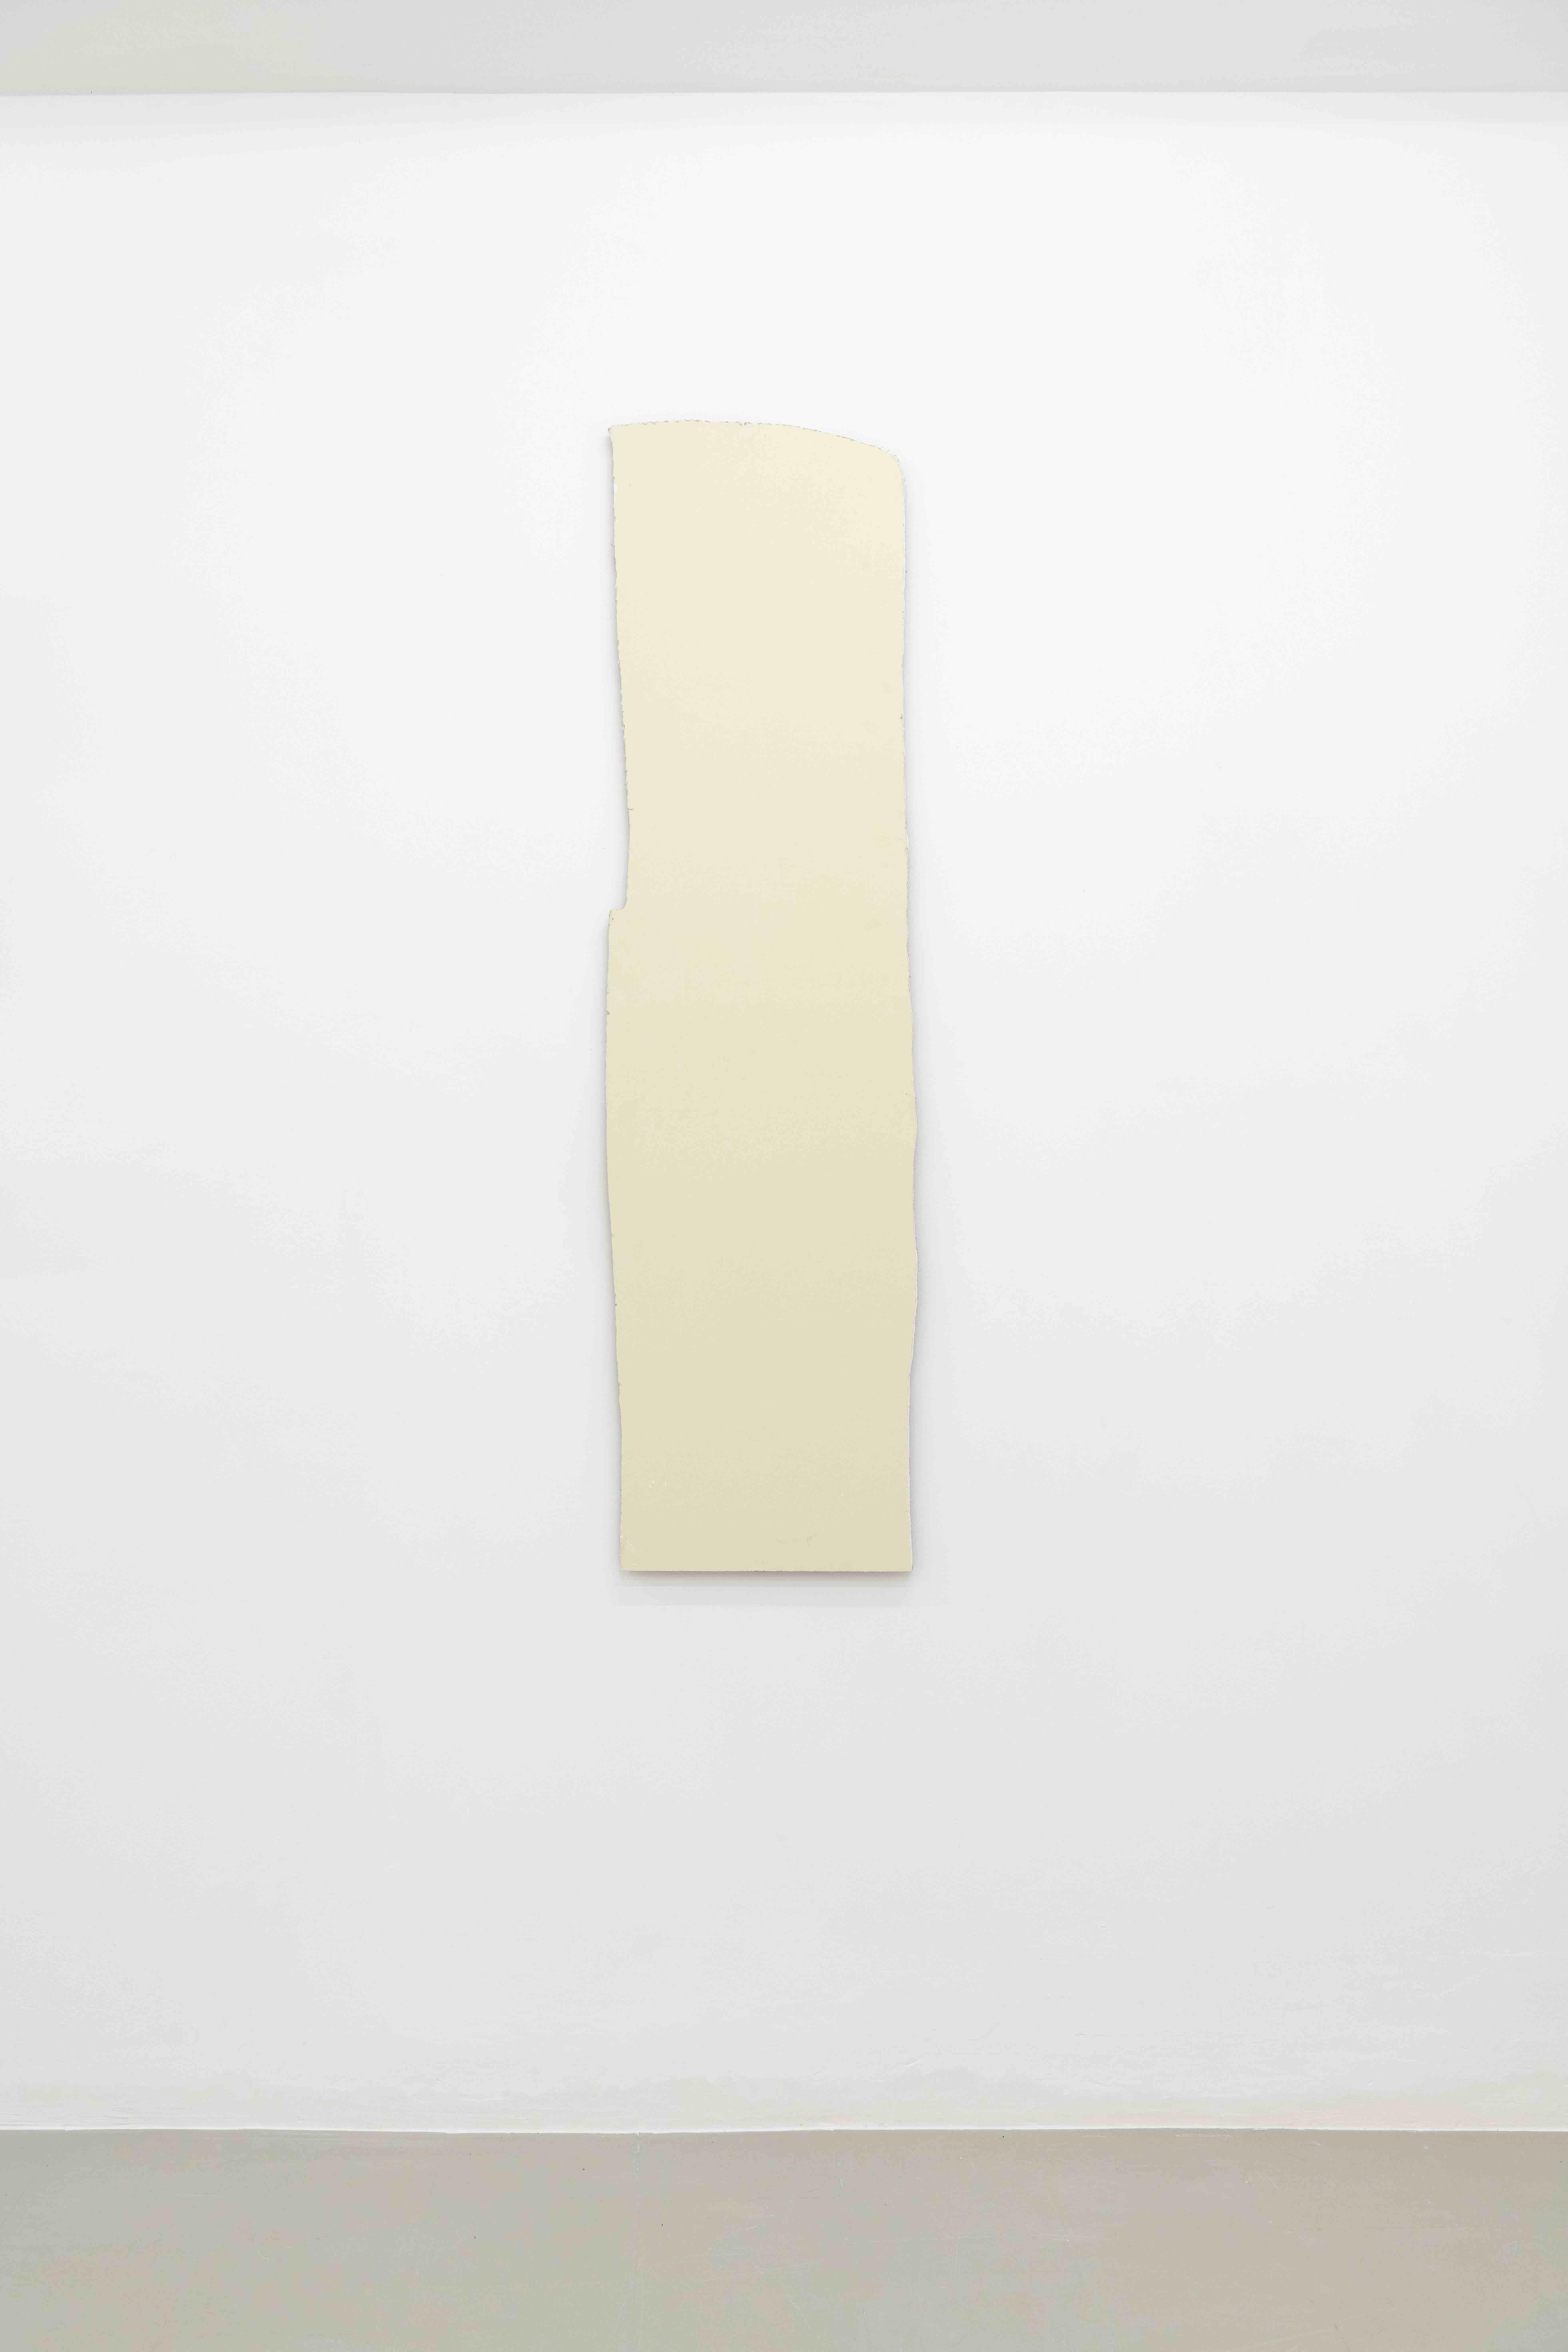 Plamen Dejanoff, Untitled (Palais Slav) 2019, Plasterboard wall, 184 x 47cm, Galerie Emanuel Layr Rome